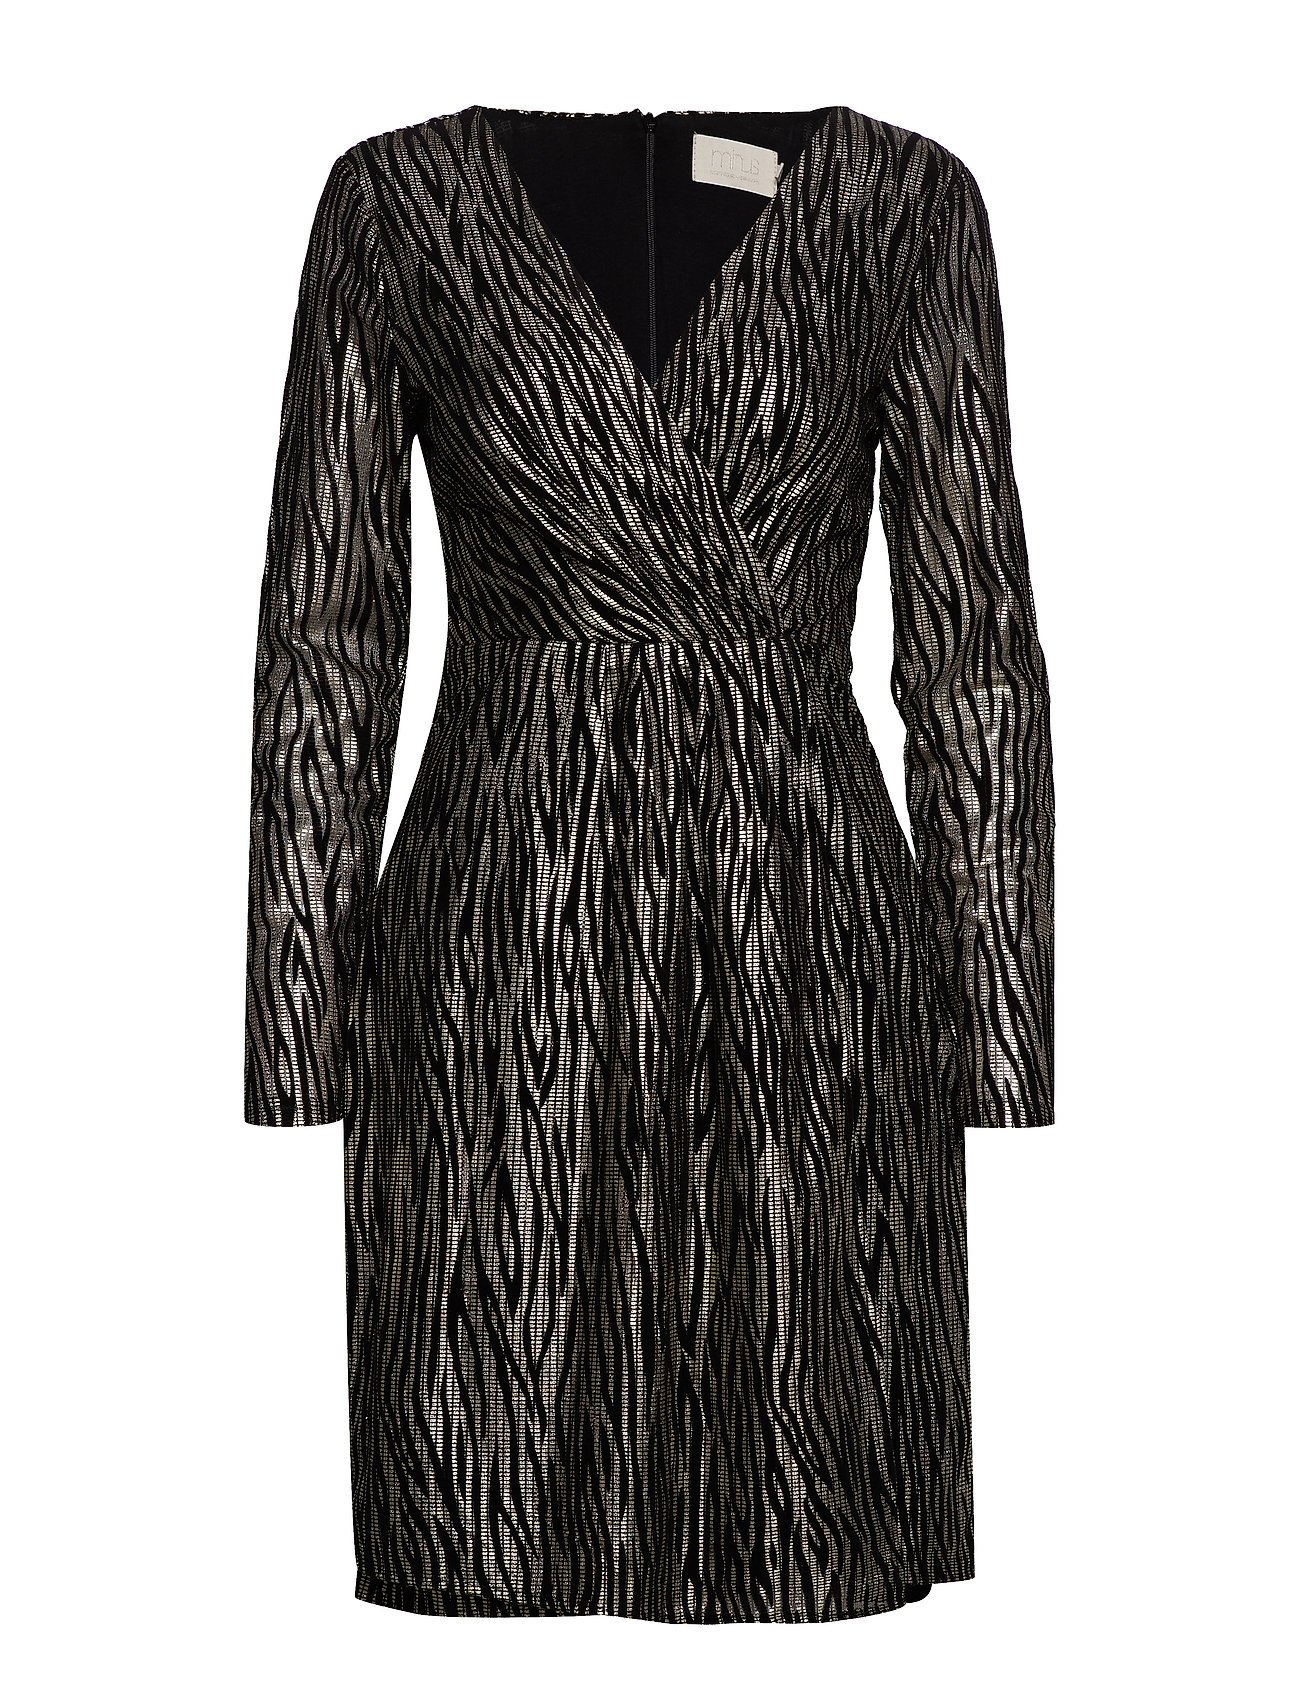 Minus Ilsabeth dress Boozt - BLACK W/GOLD